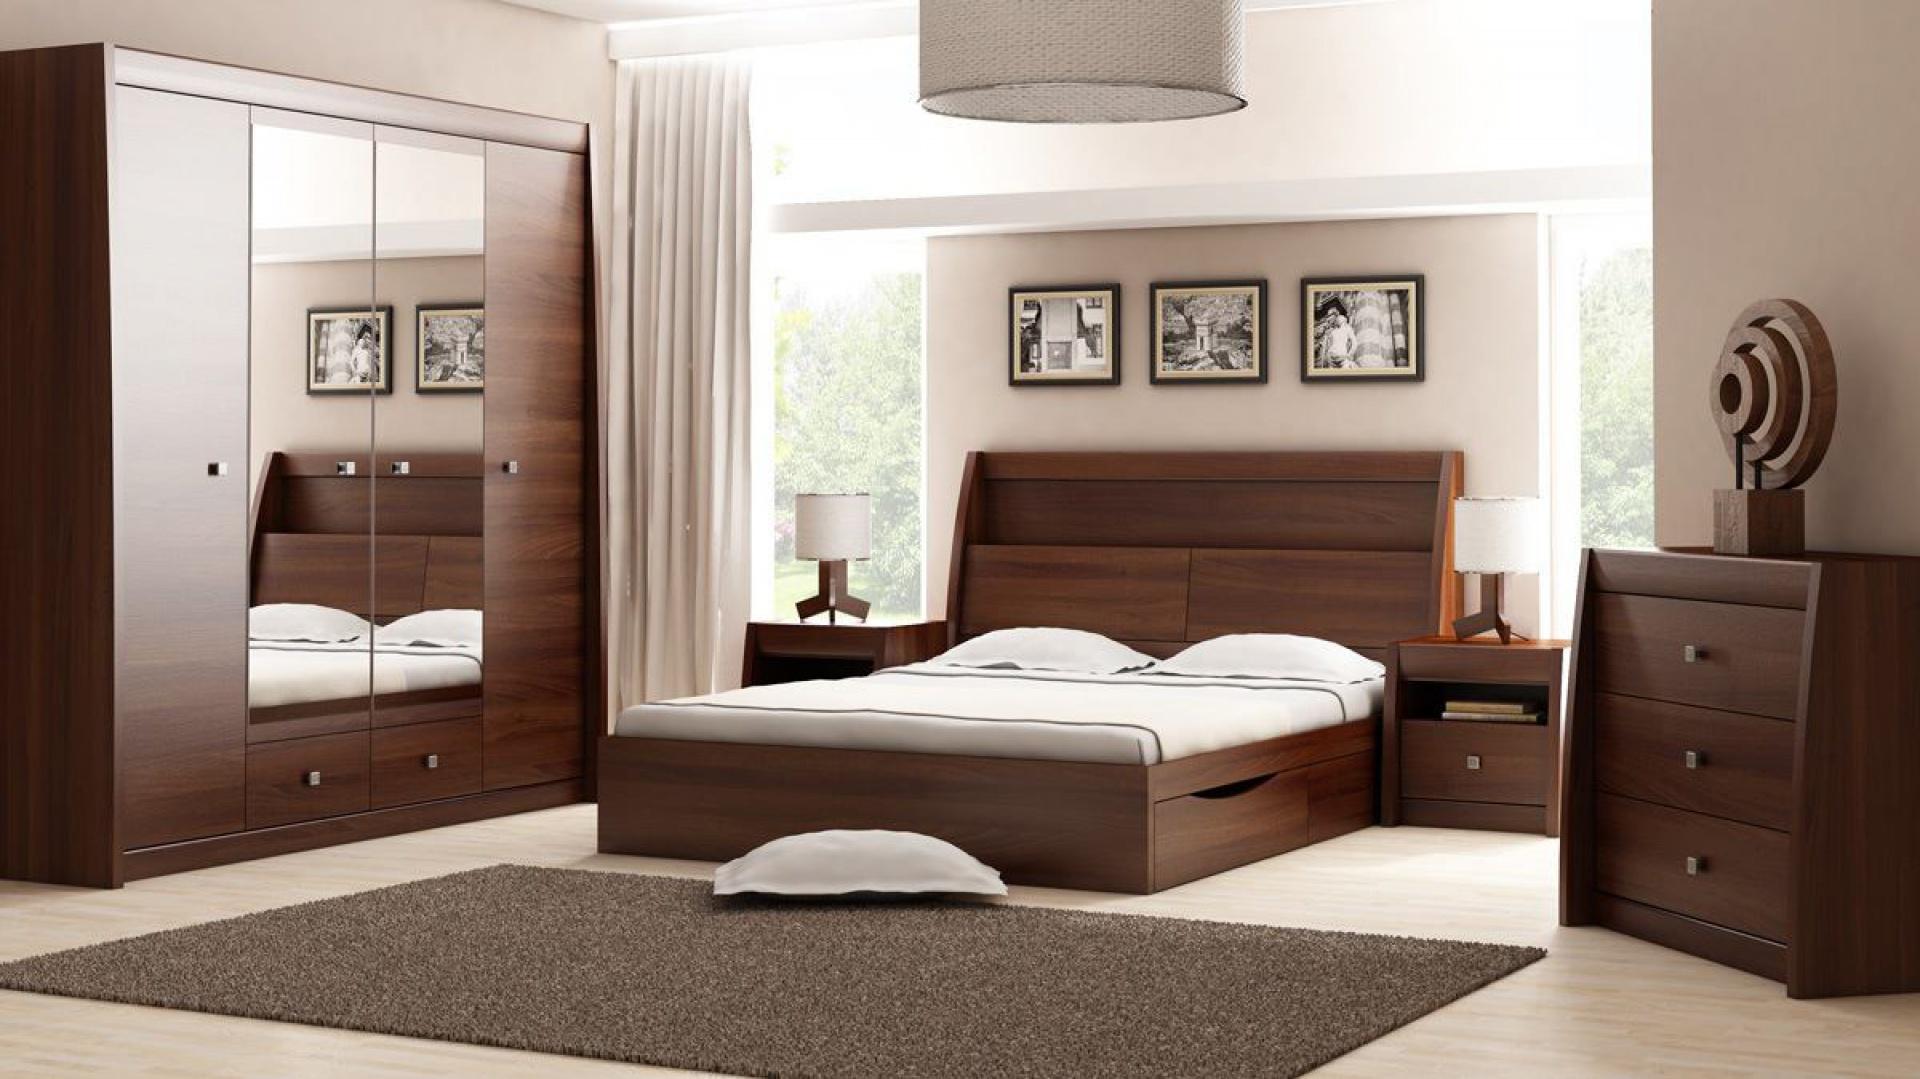 sypialnia sewilla z bokami meble do sypialni ciemne